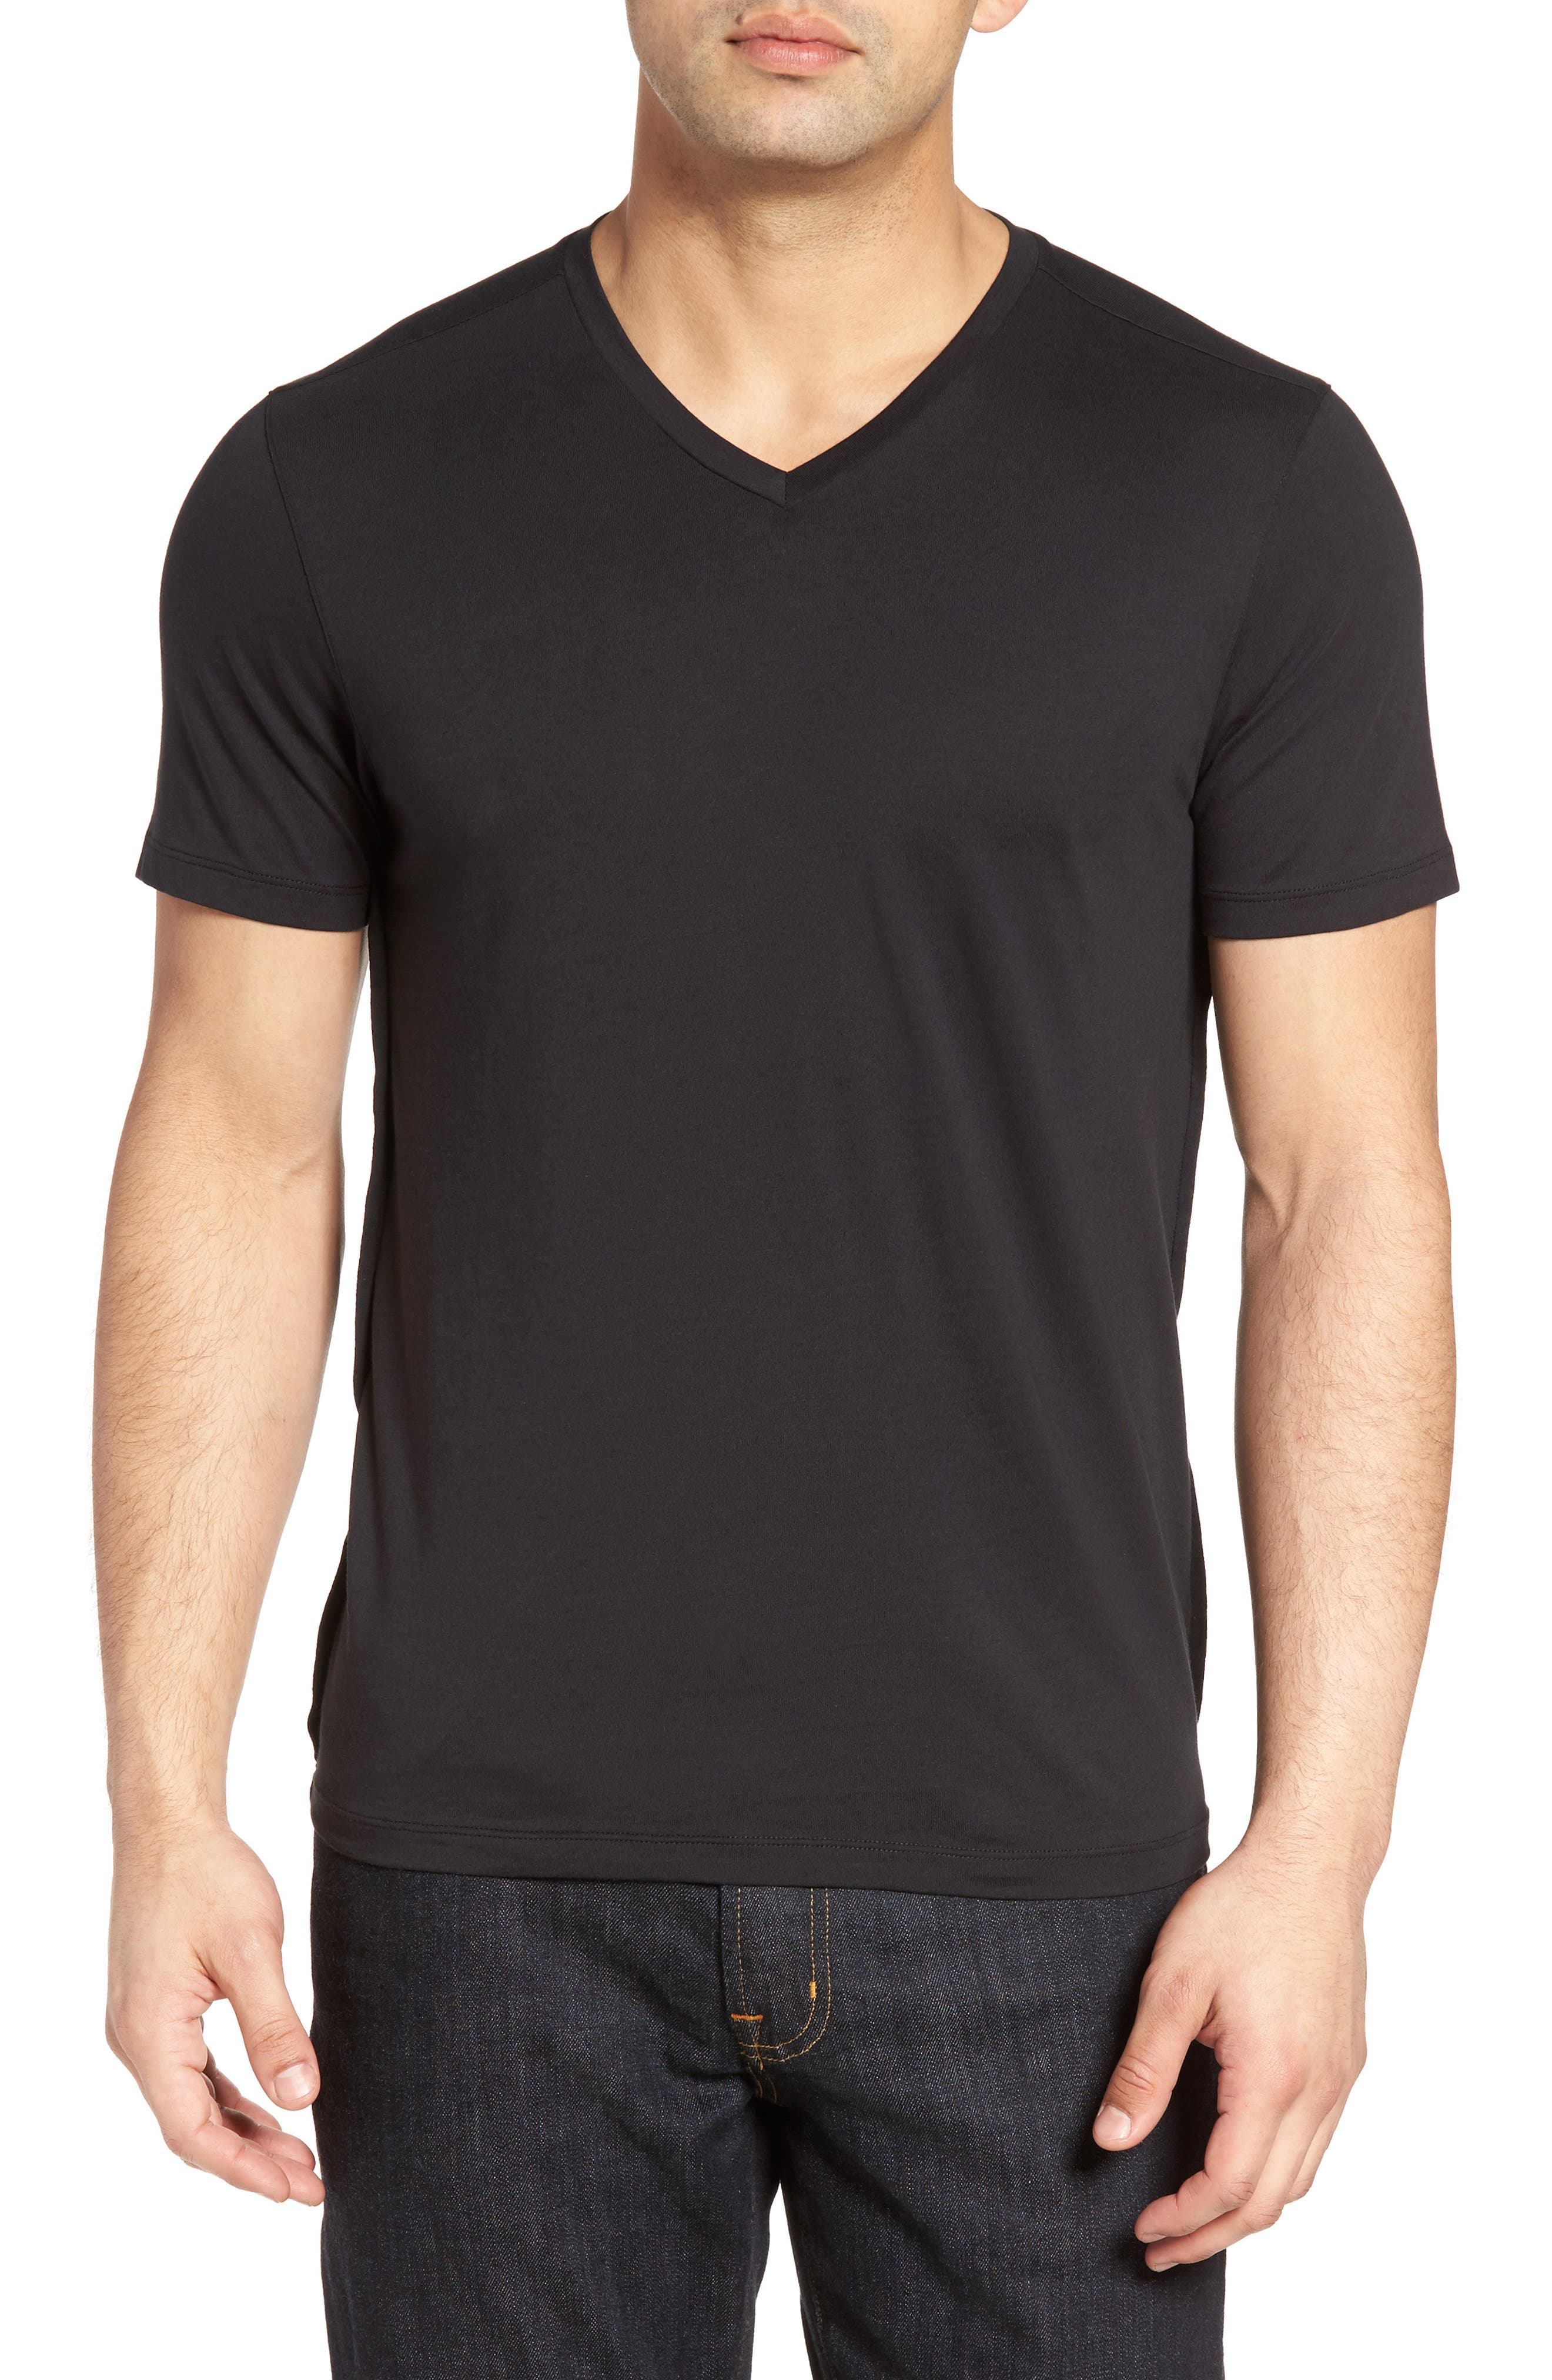 Alternate Image 1 Selected - Zachary Prell Mercer Jersey T-Shirt